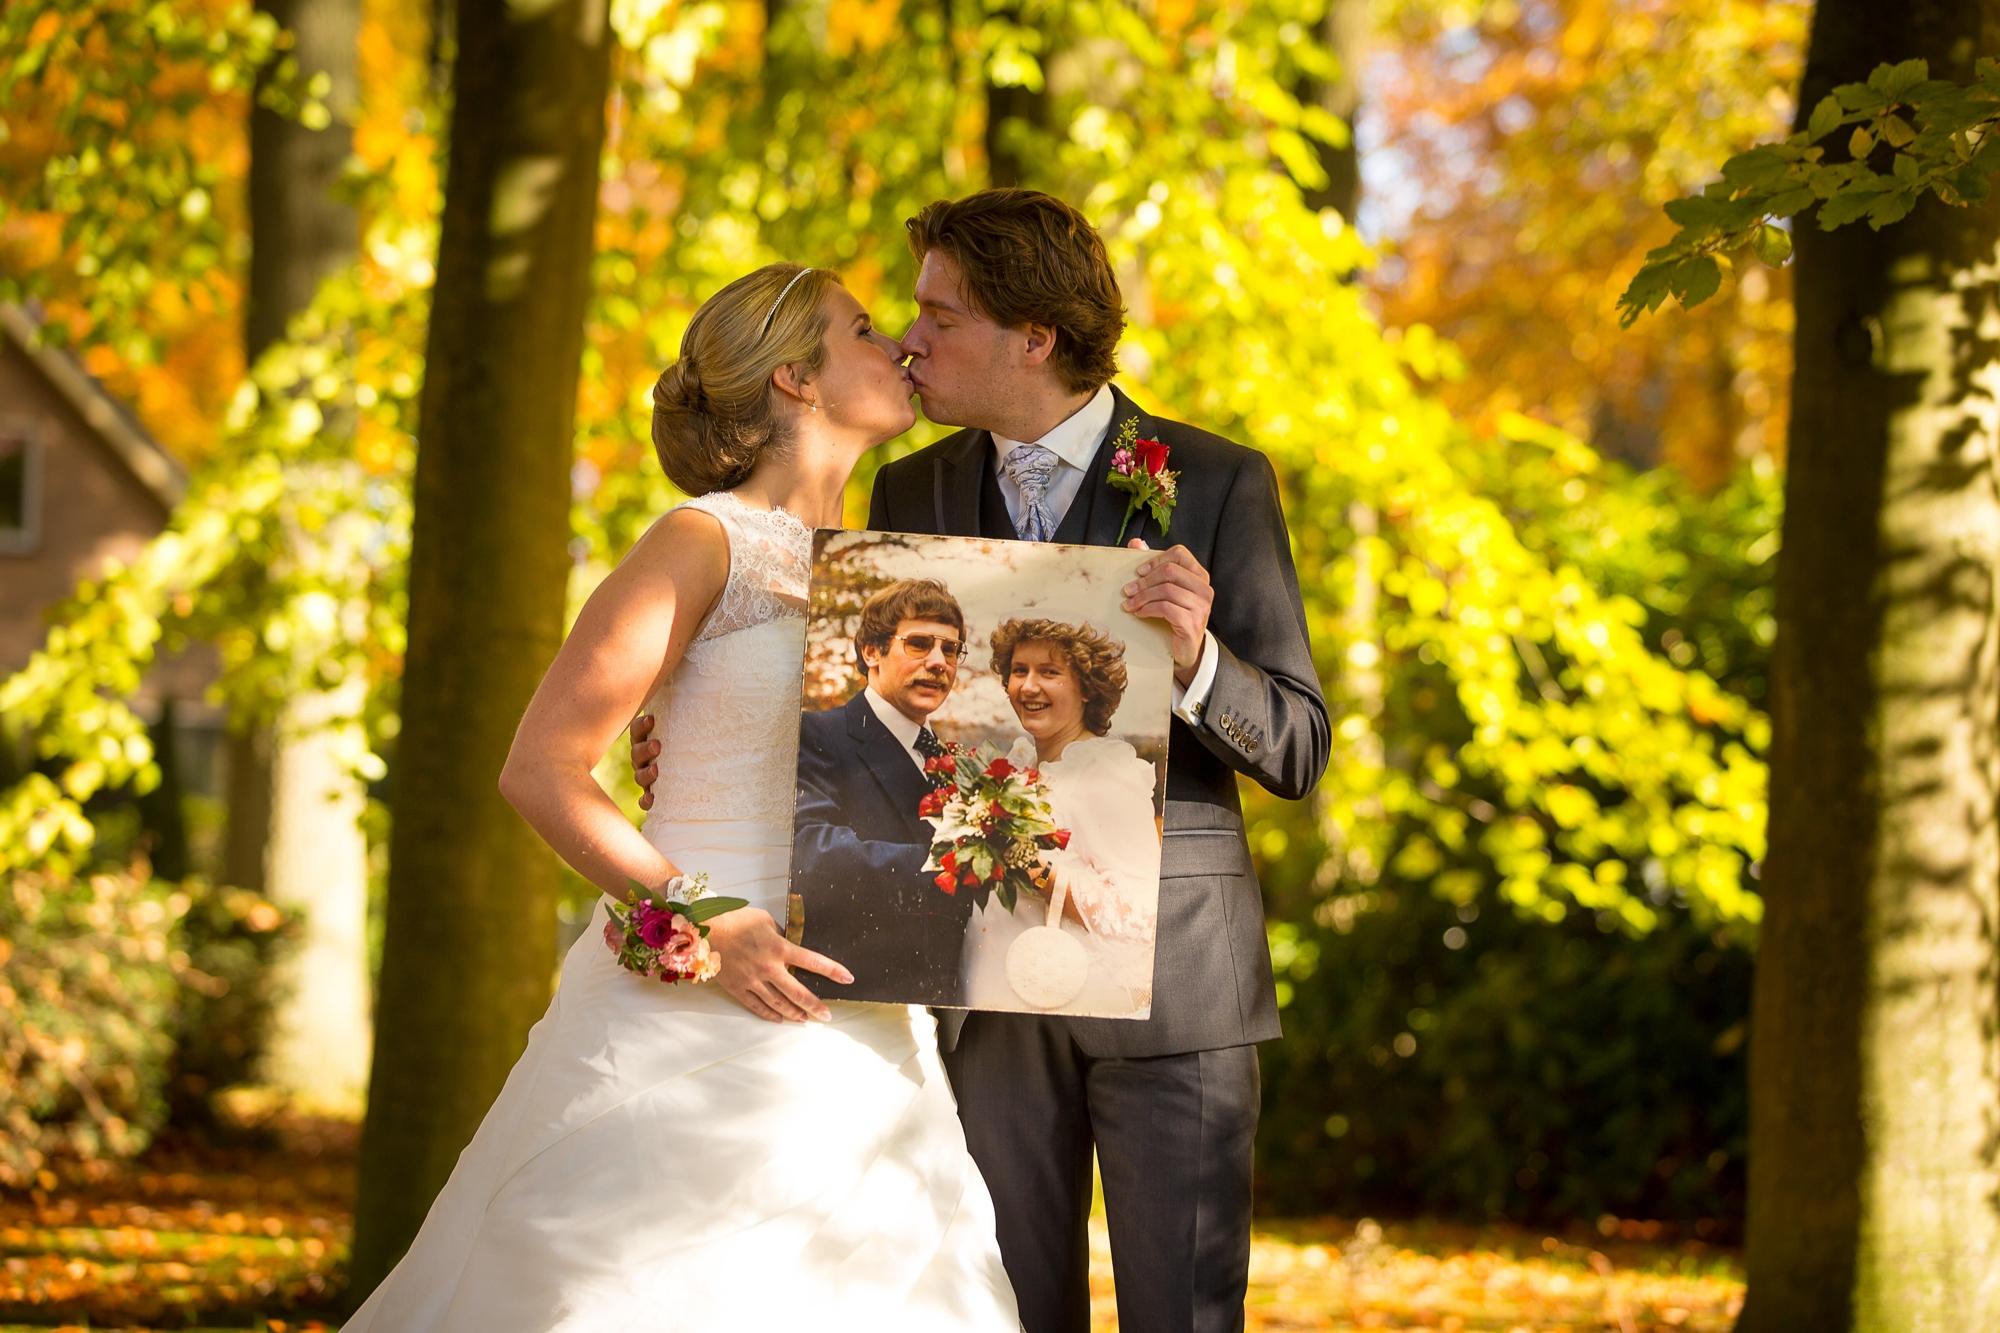 bruidsfotografie-trouwreportage-huwelijksfotografie-bruidsfotograaf-feestfotografie-Ingeborg en Martijn-23.jpg